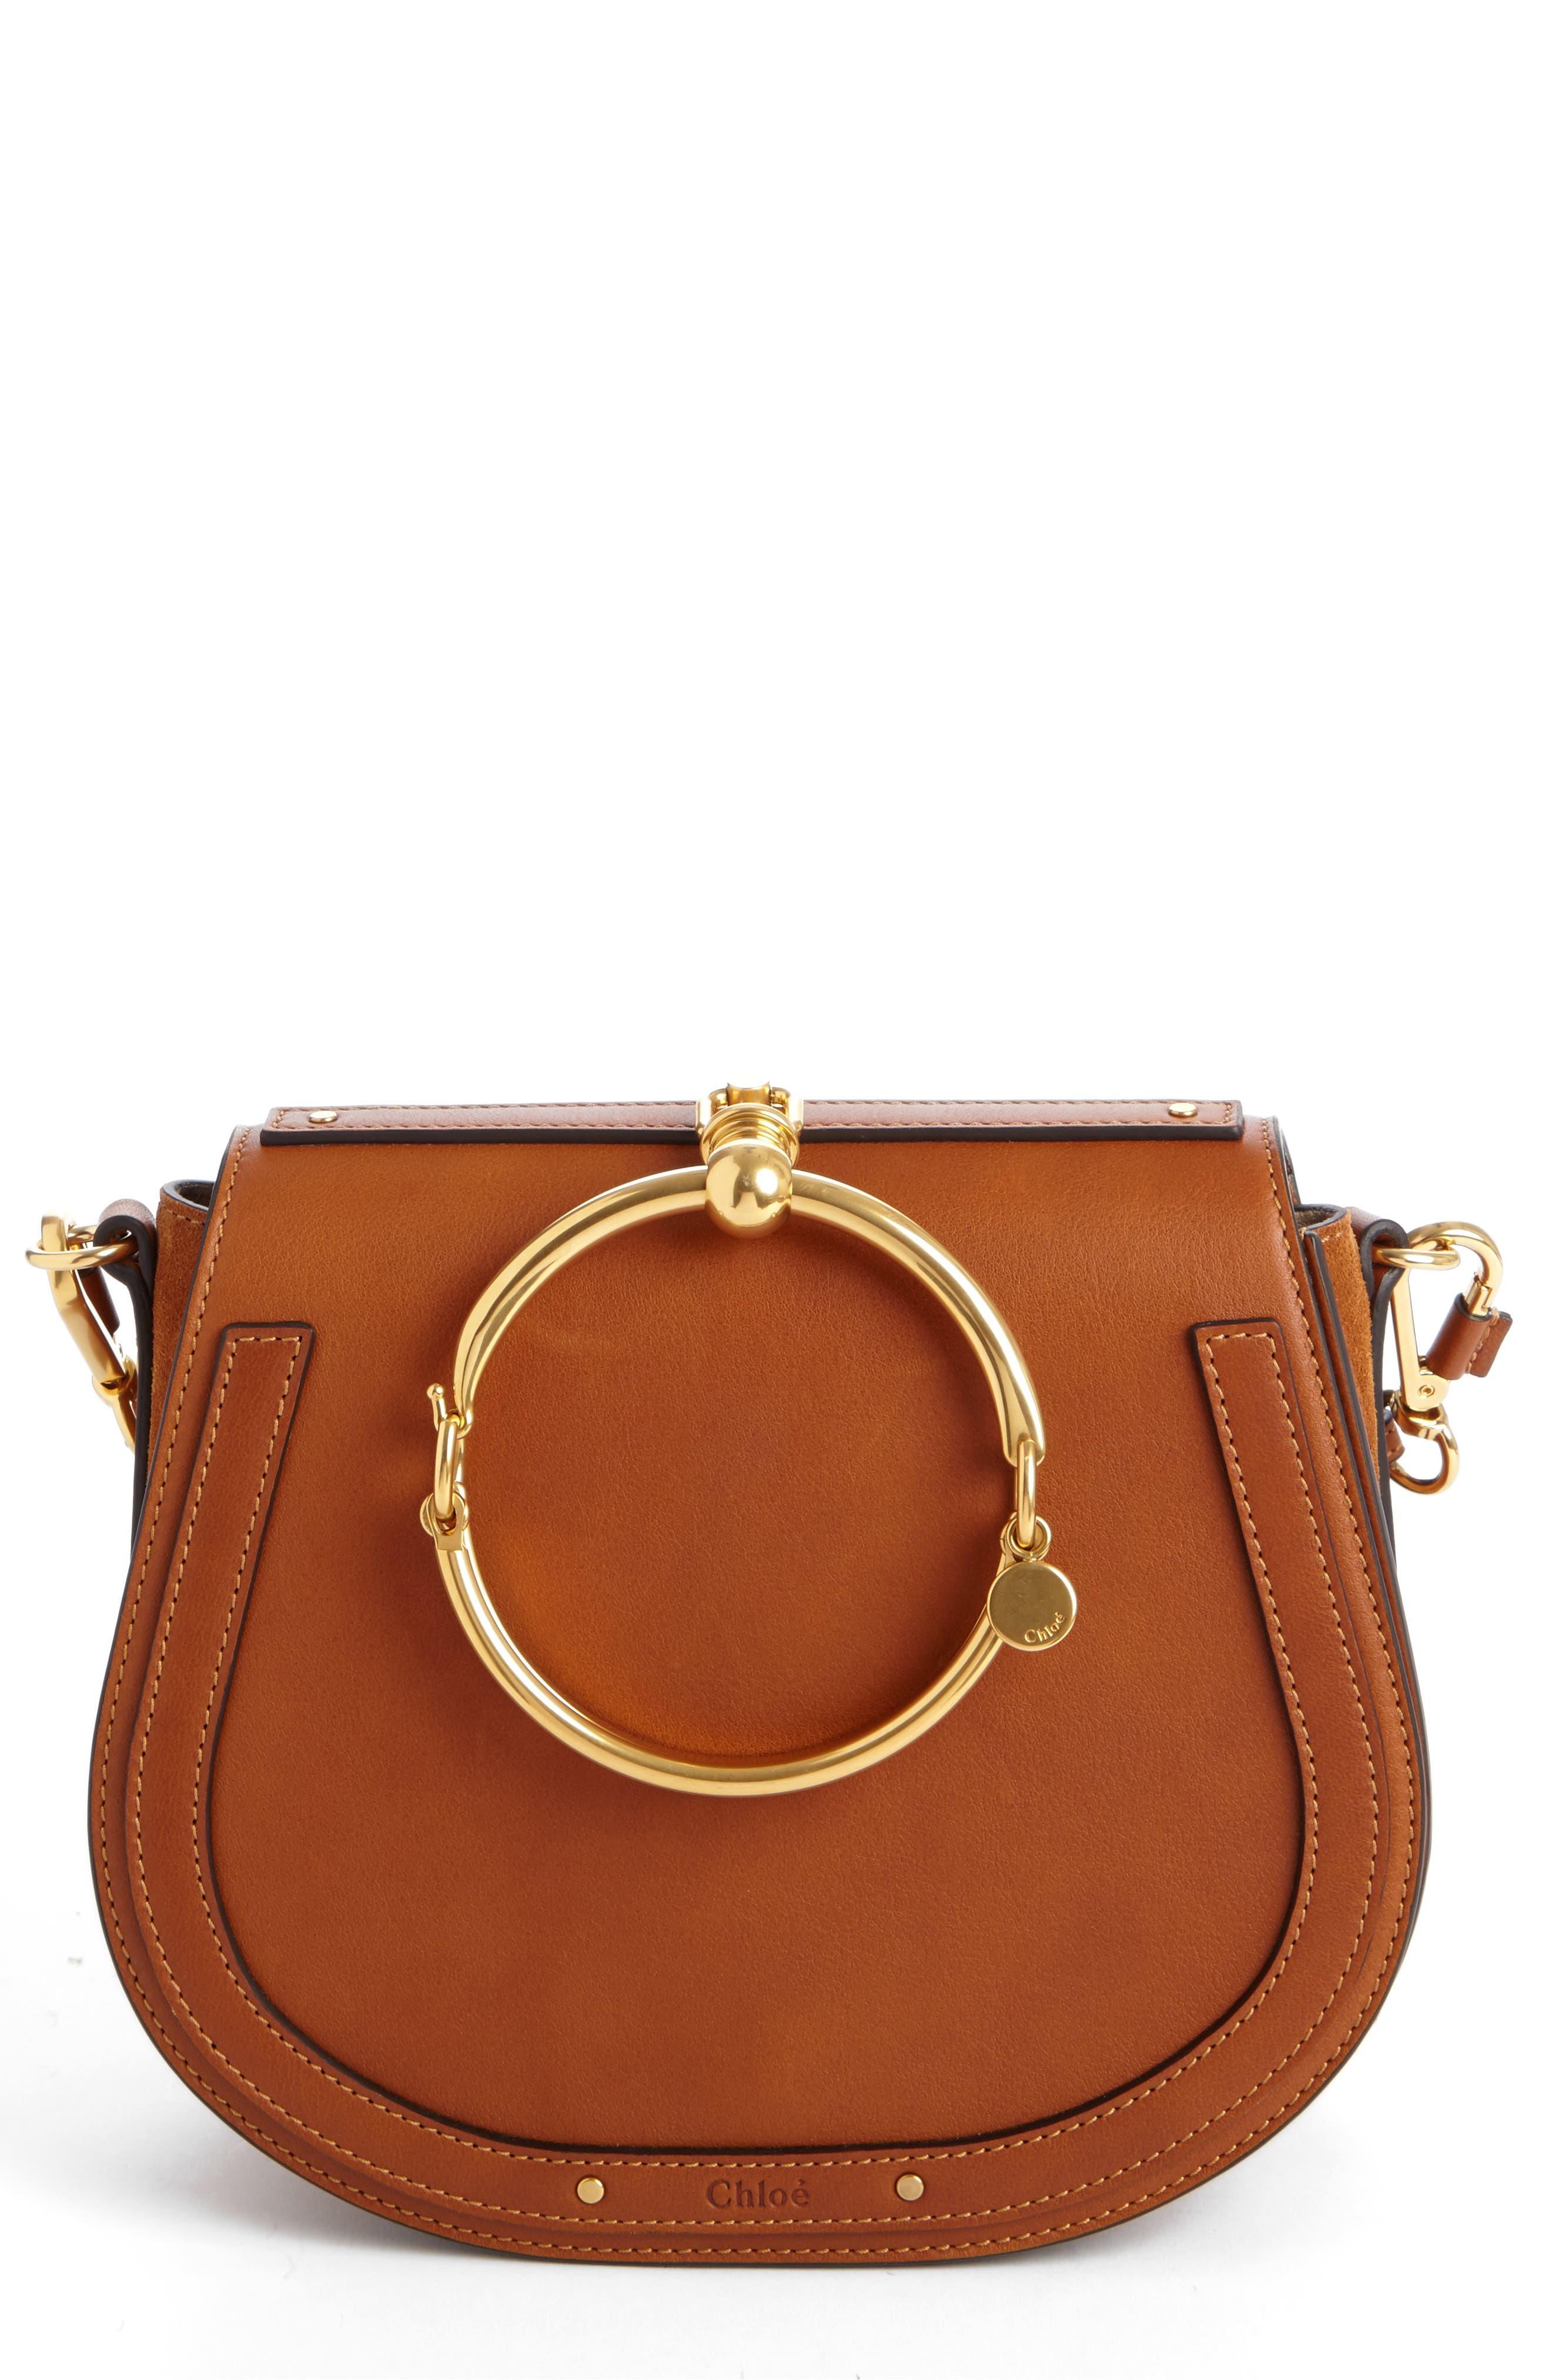 CHLOE   Chloe Medium Nile Leather Bracelet Saddle Bag - Brown   Goxip